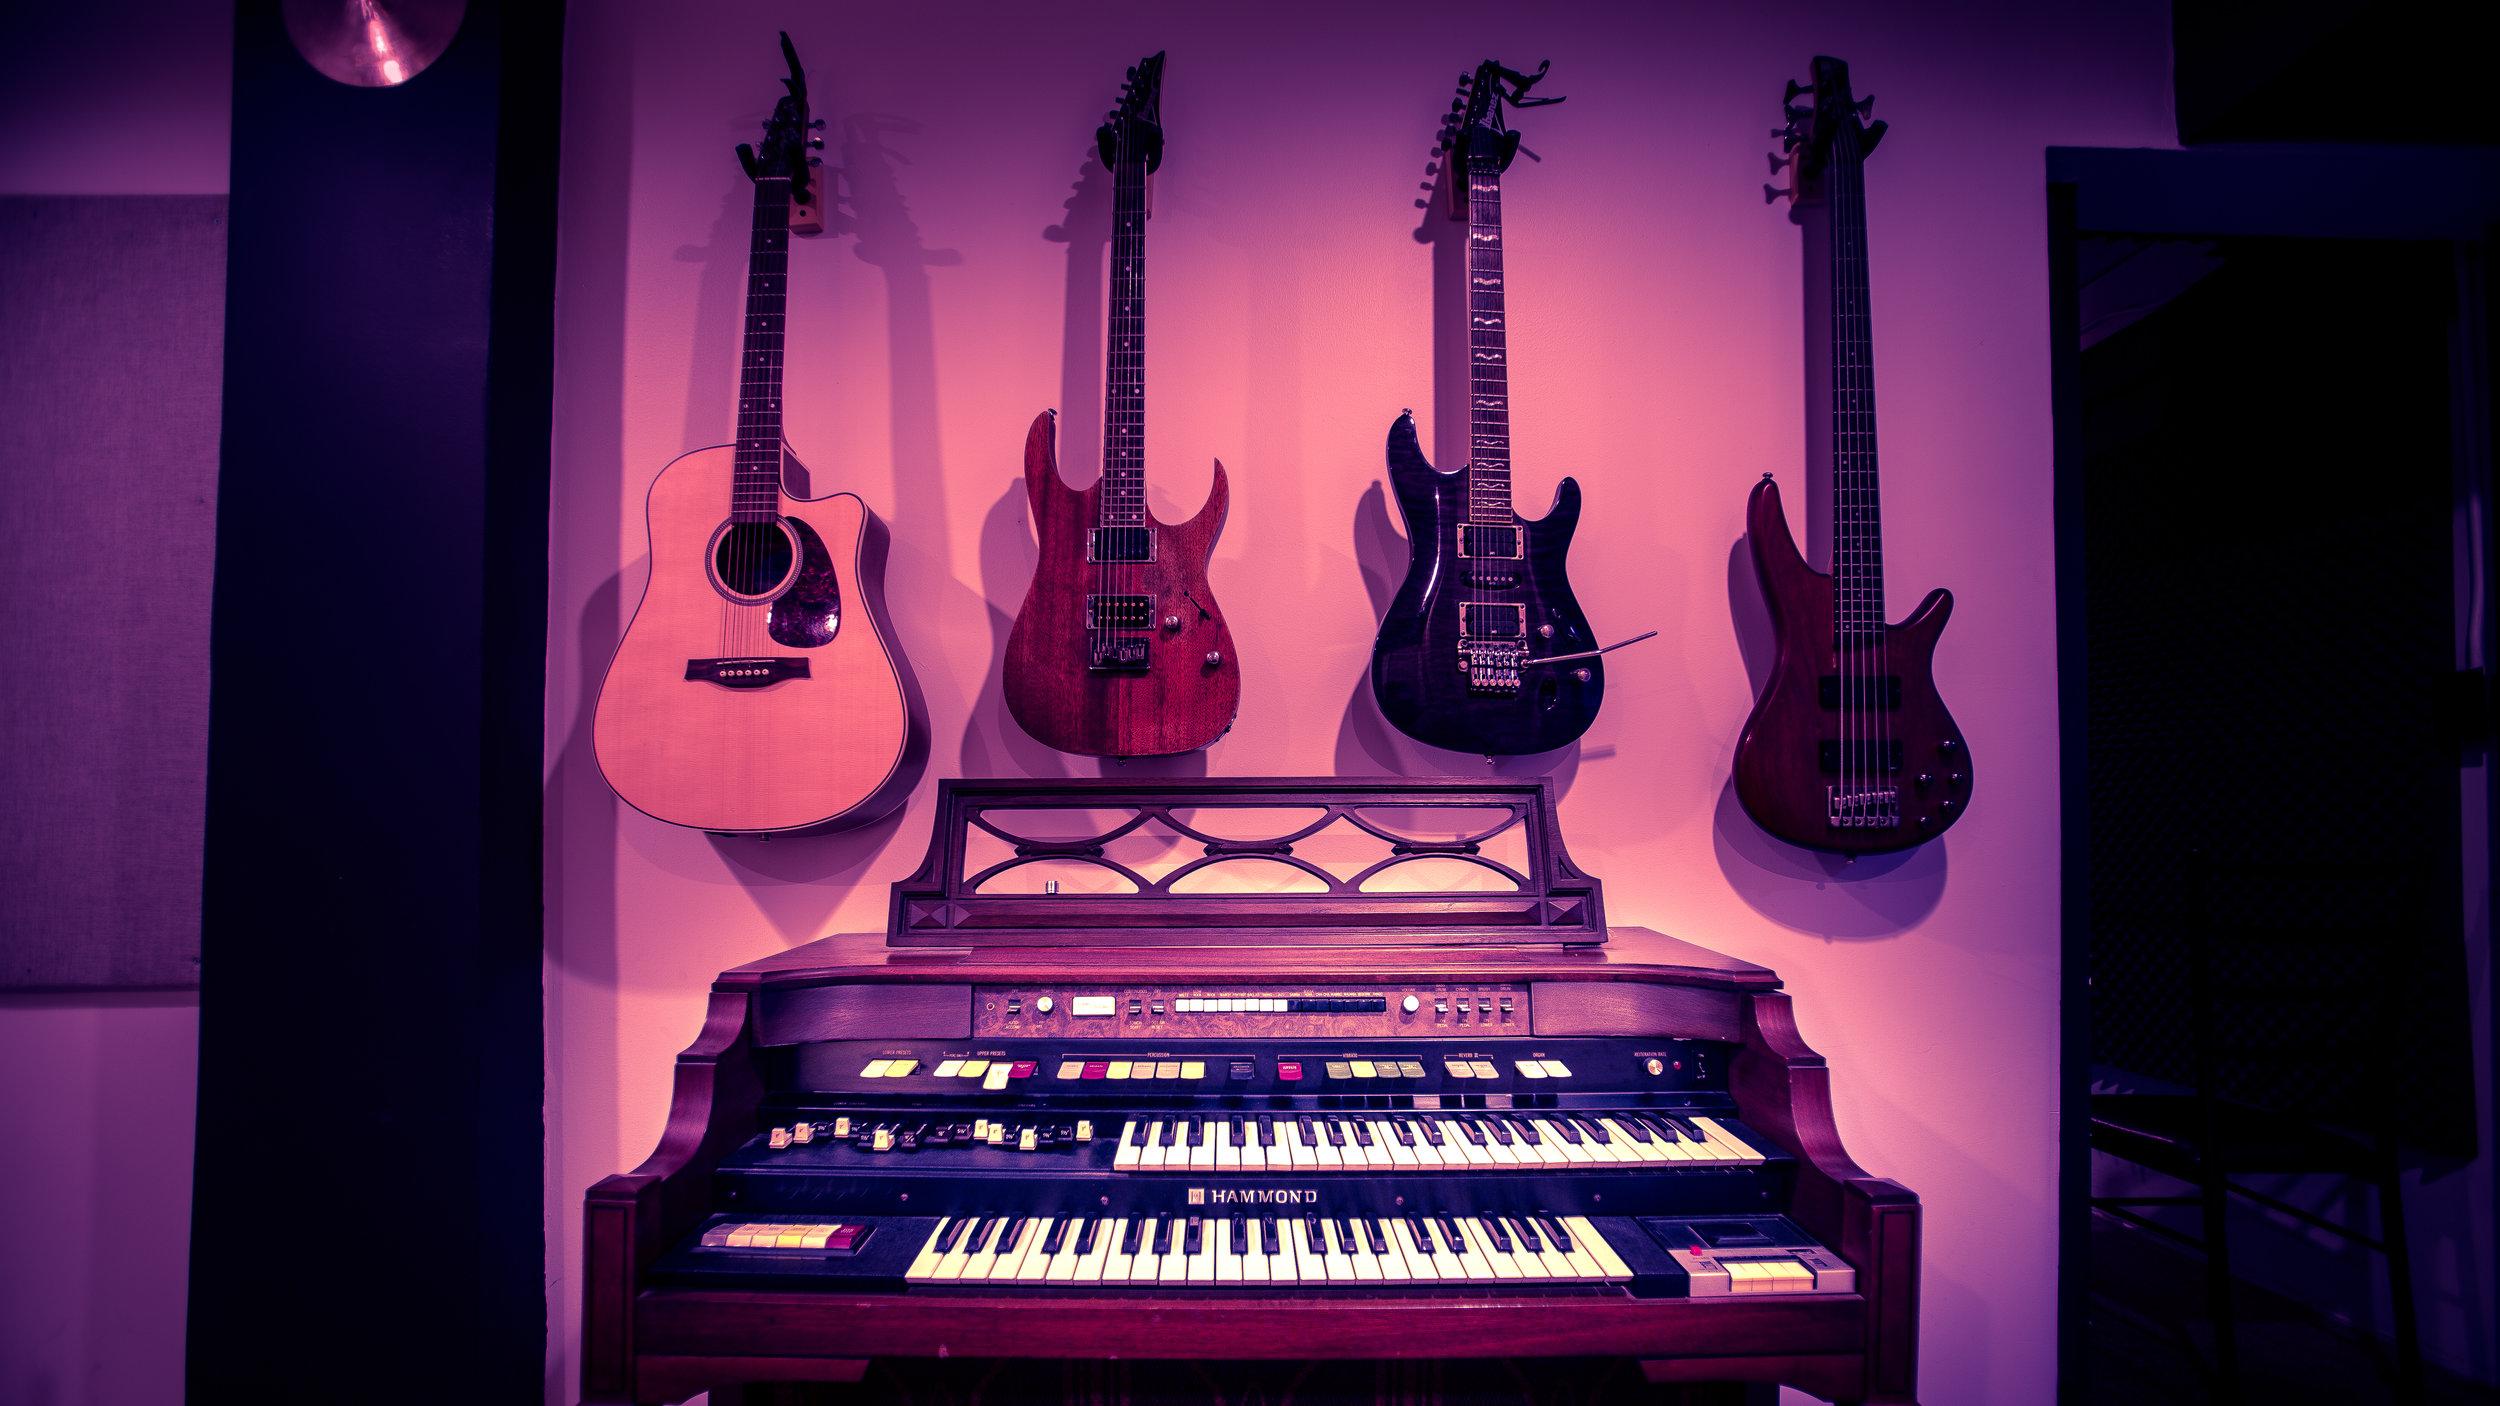 guitarsorgan.jpg